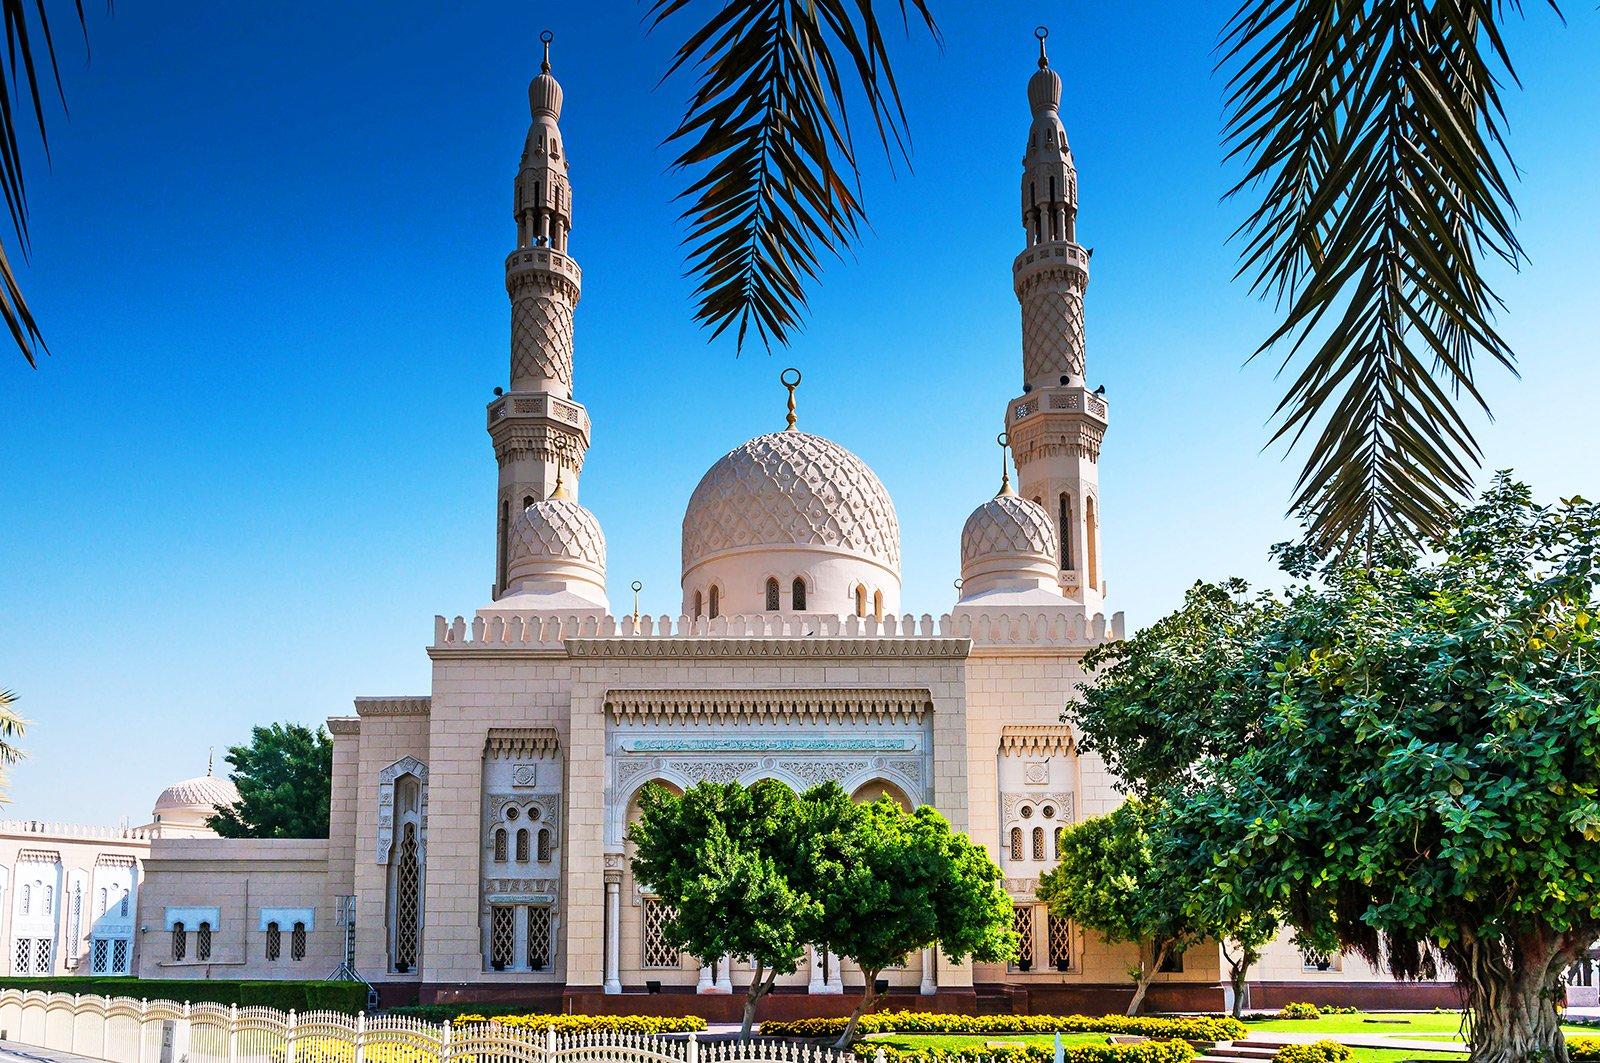 Jumeirah mosque дубай работа для русскоговорящих в дубае